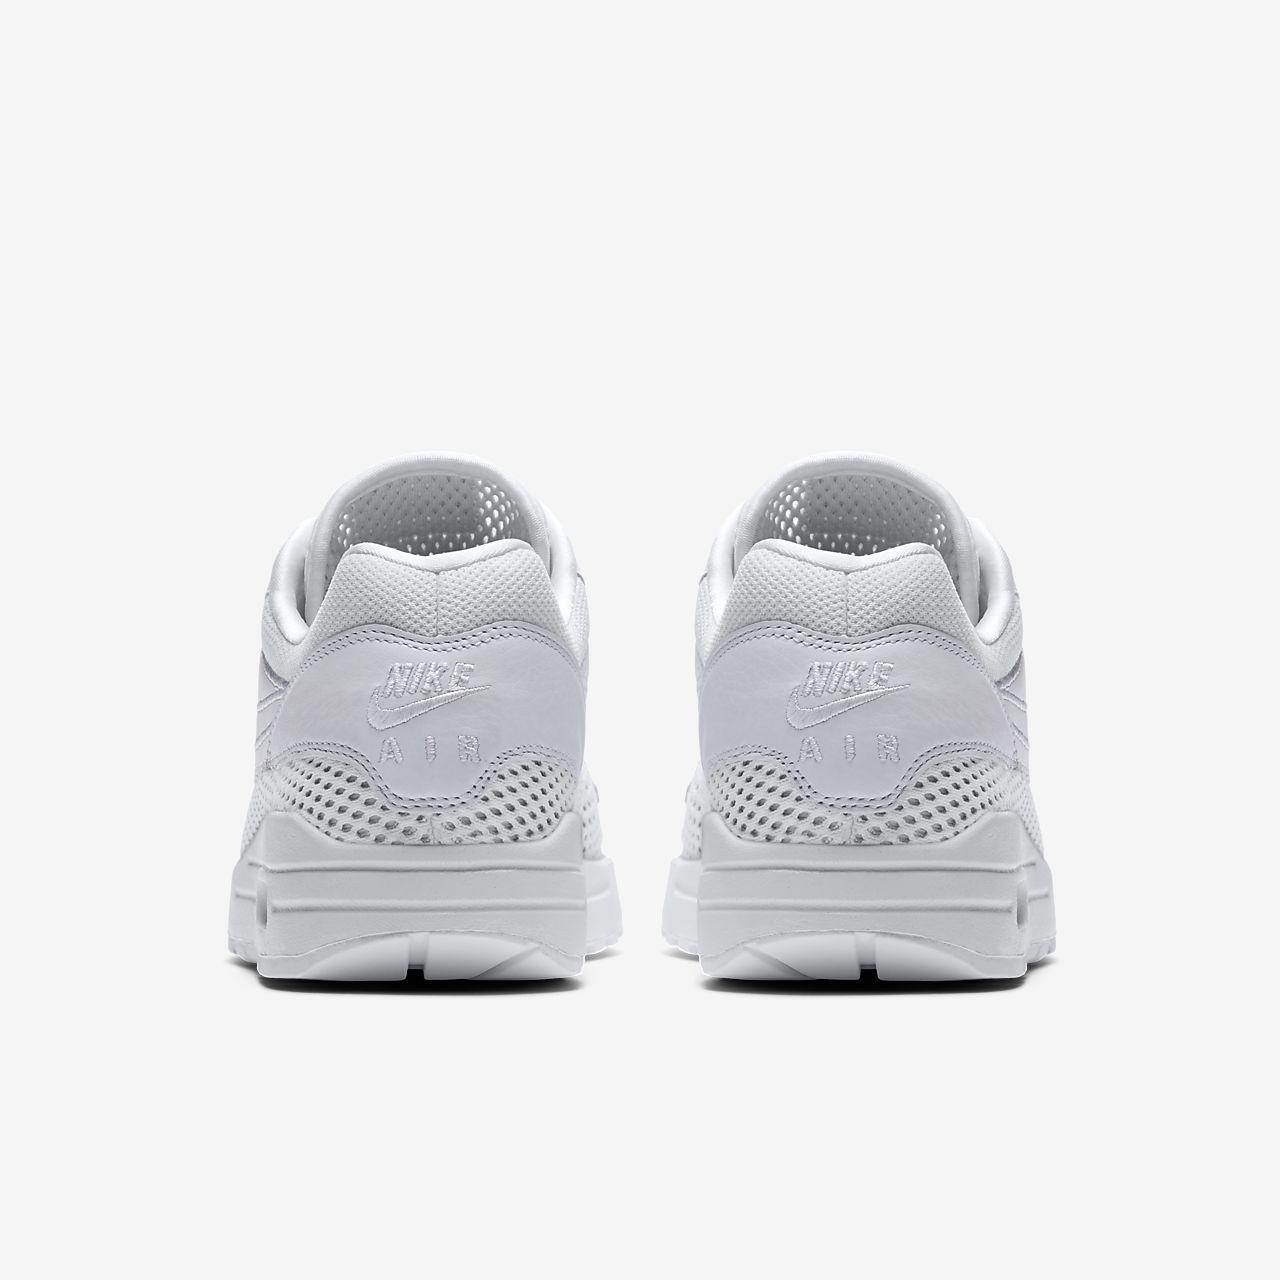 AF1 UPSTEP SI - CALZADO - Sneakers & Deportivas Nike D4EyyGzC